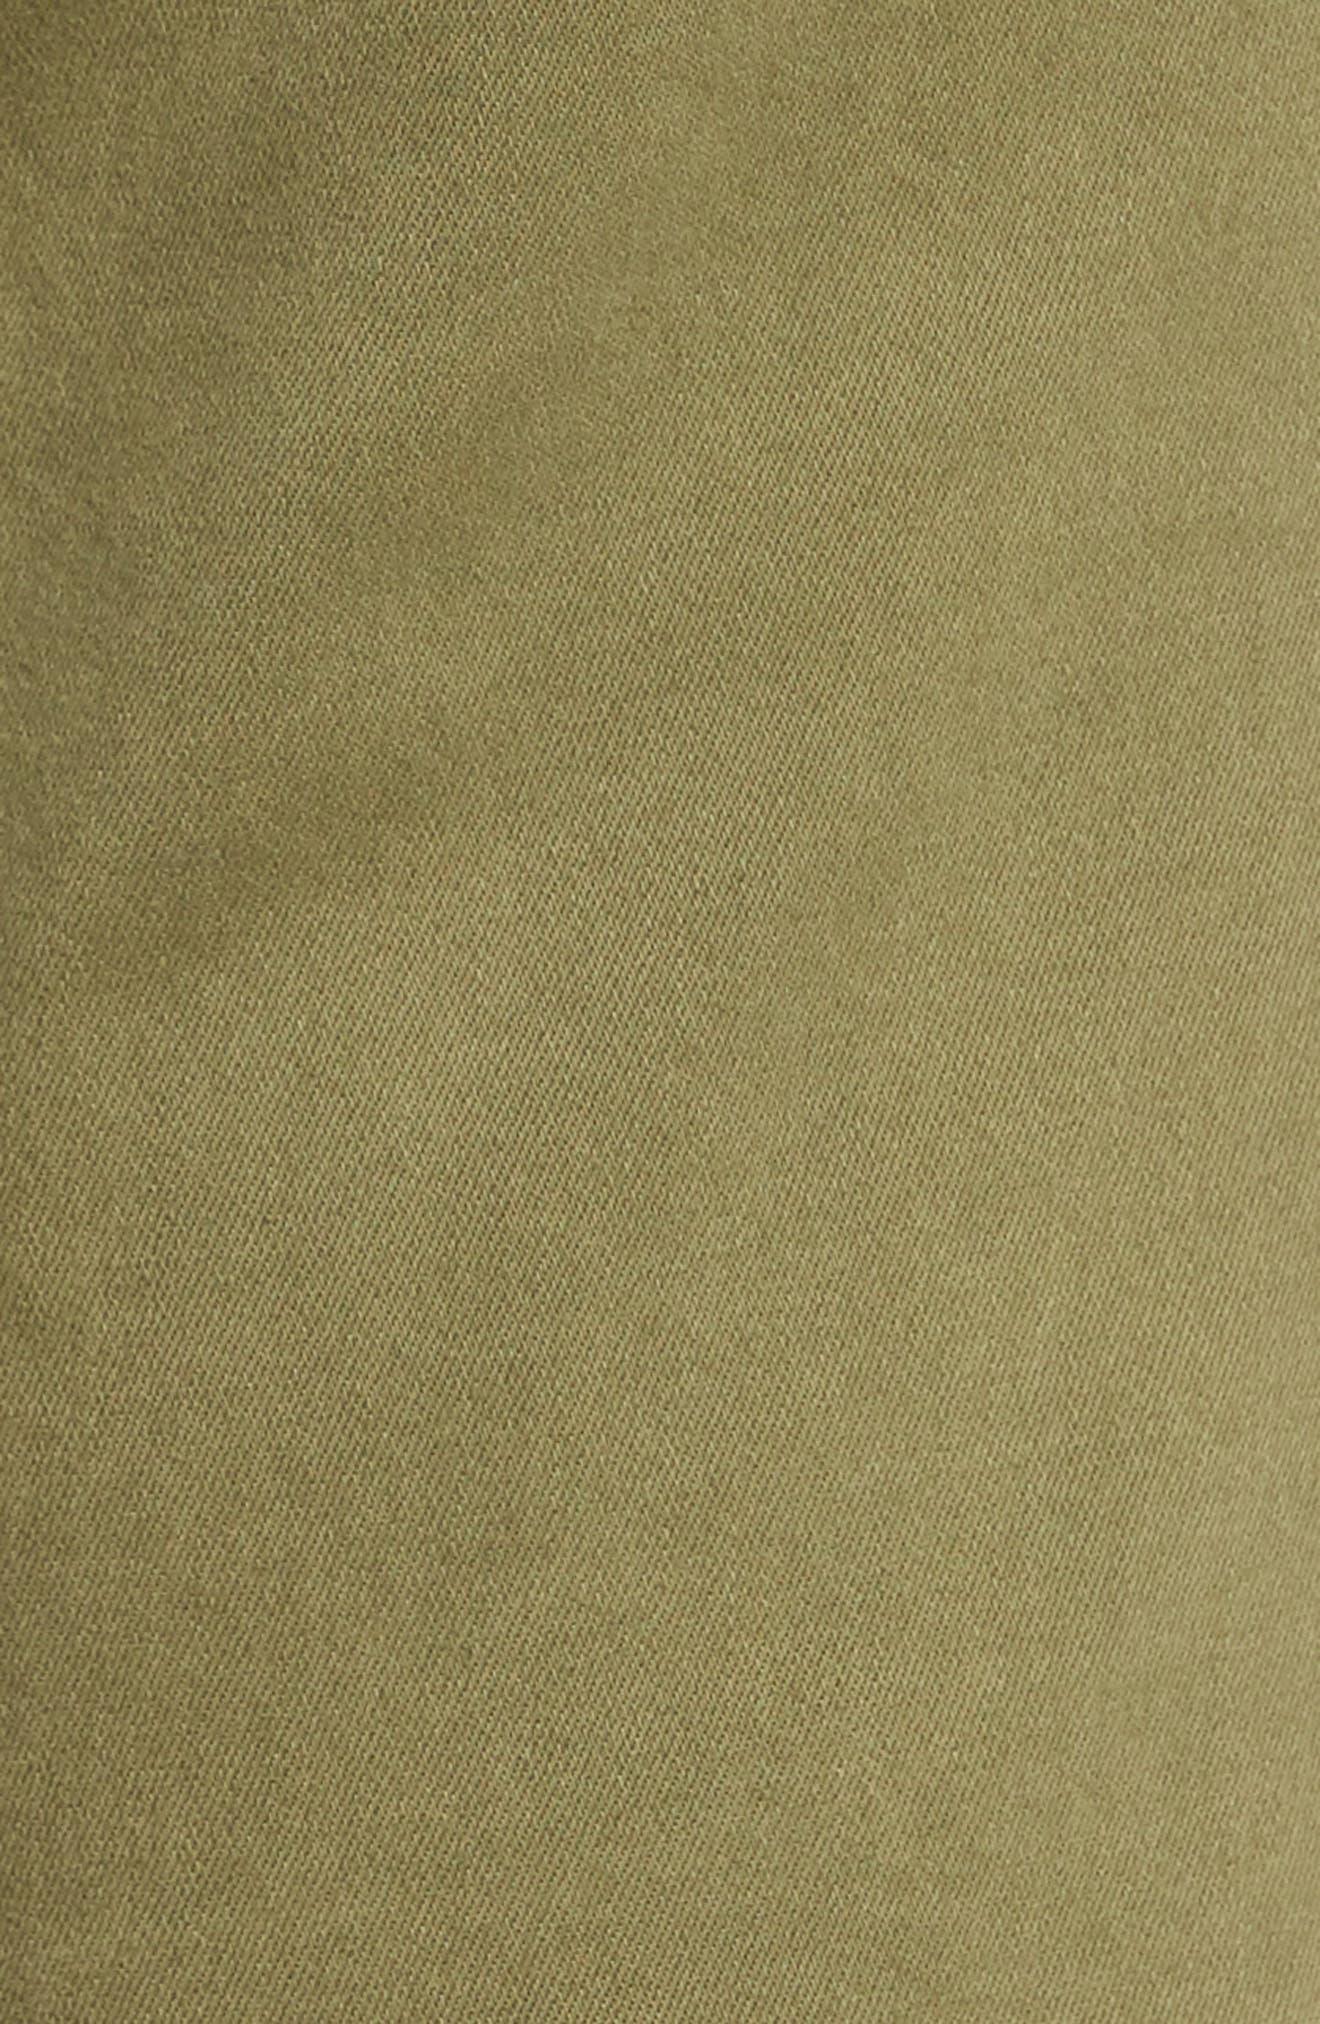 Natalie Bermuda Shorts,                             Alternate thumbnail 6, color,                             Olive